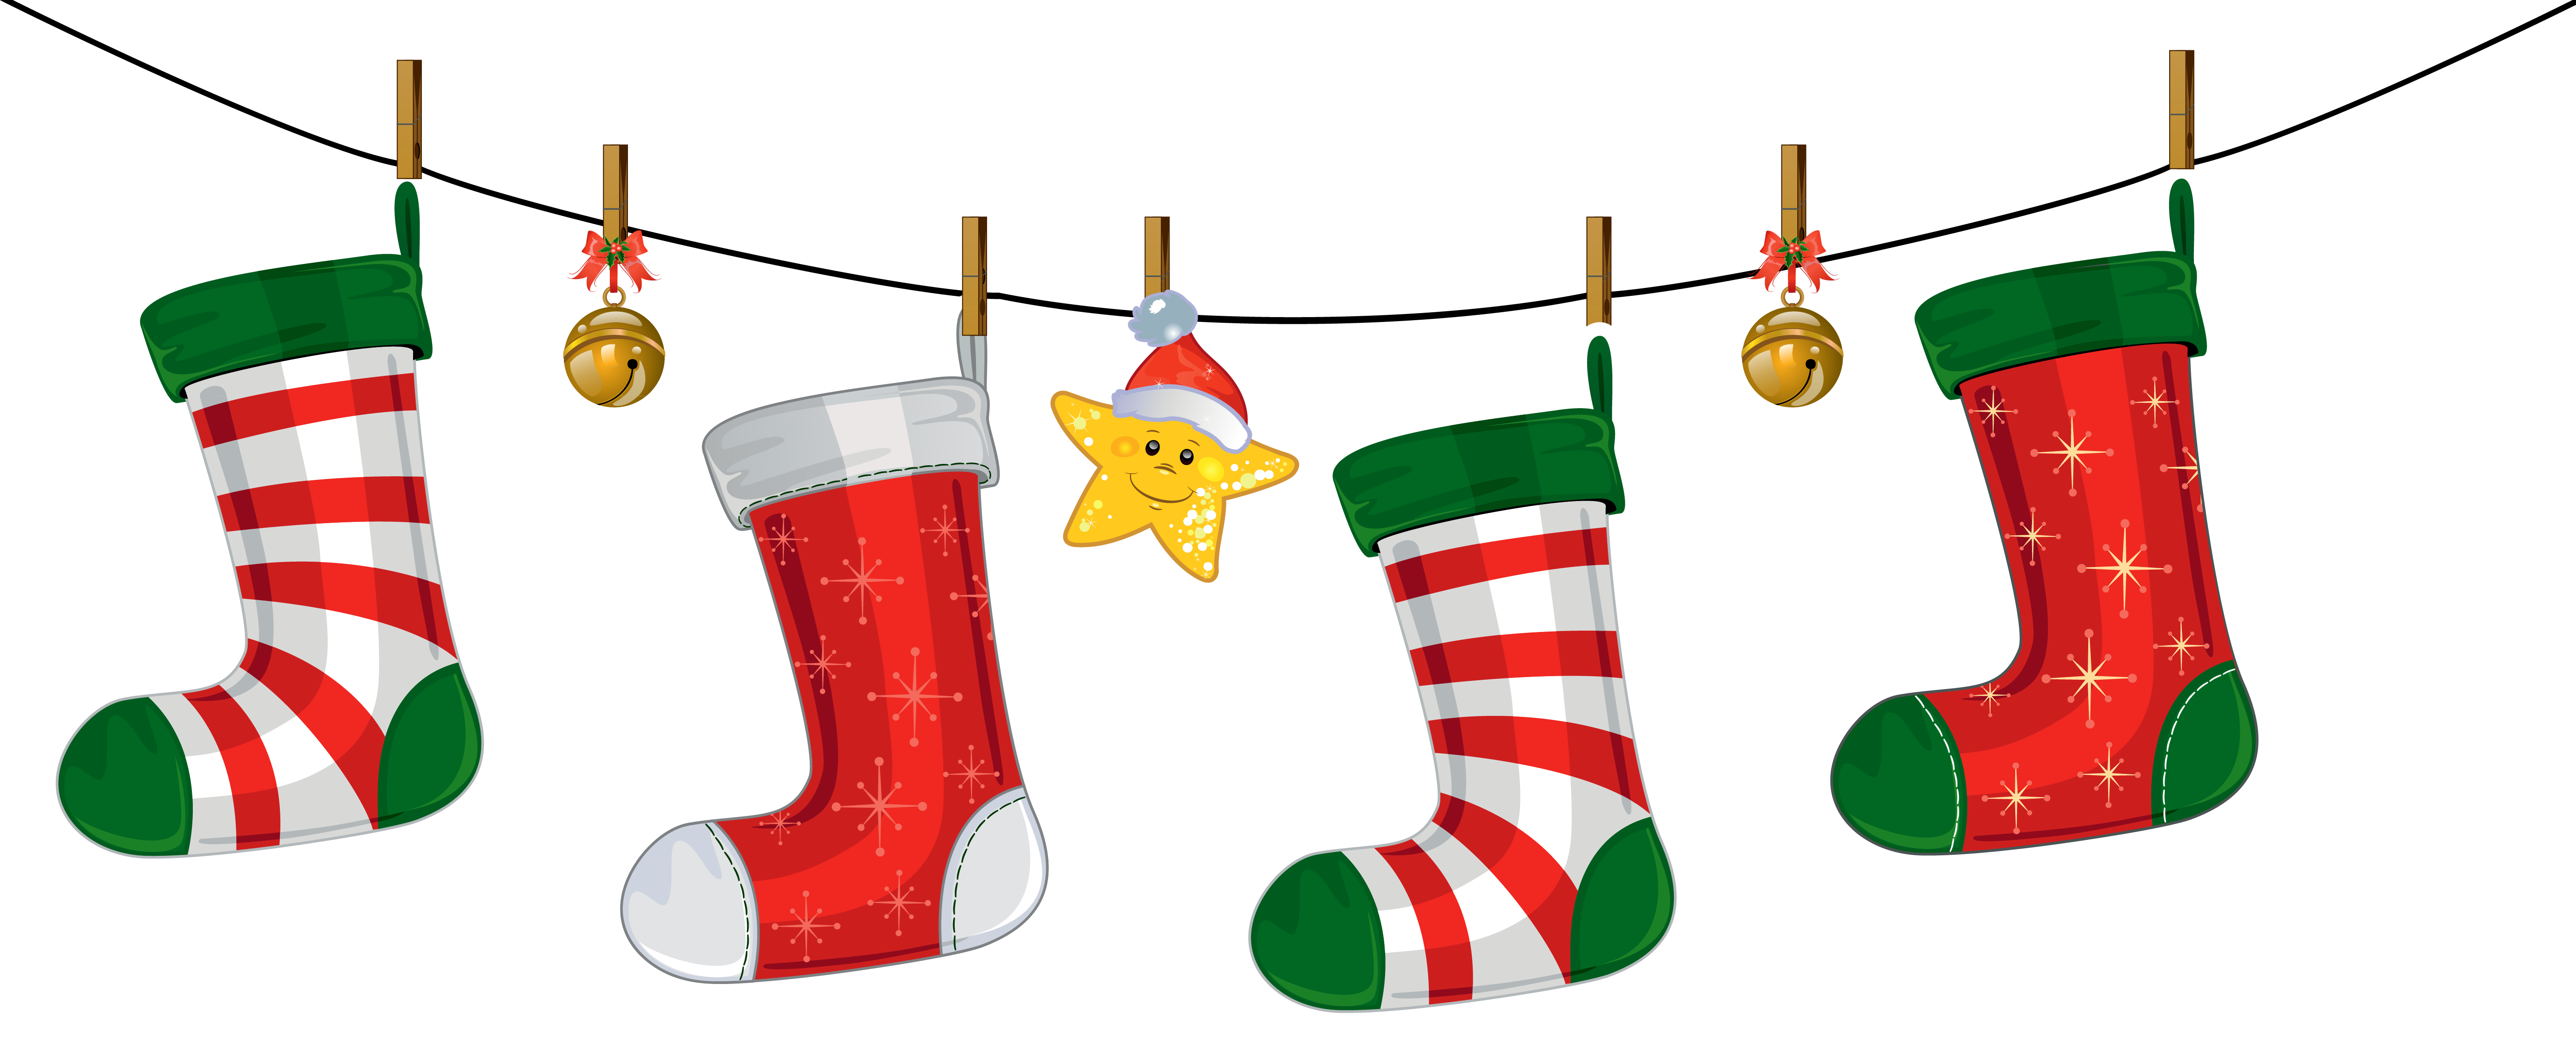 Transparent Christmas Stockings Decorati-Transparent Christmas Stockings Decoration Png Clipart Japoland-17